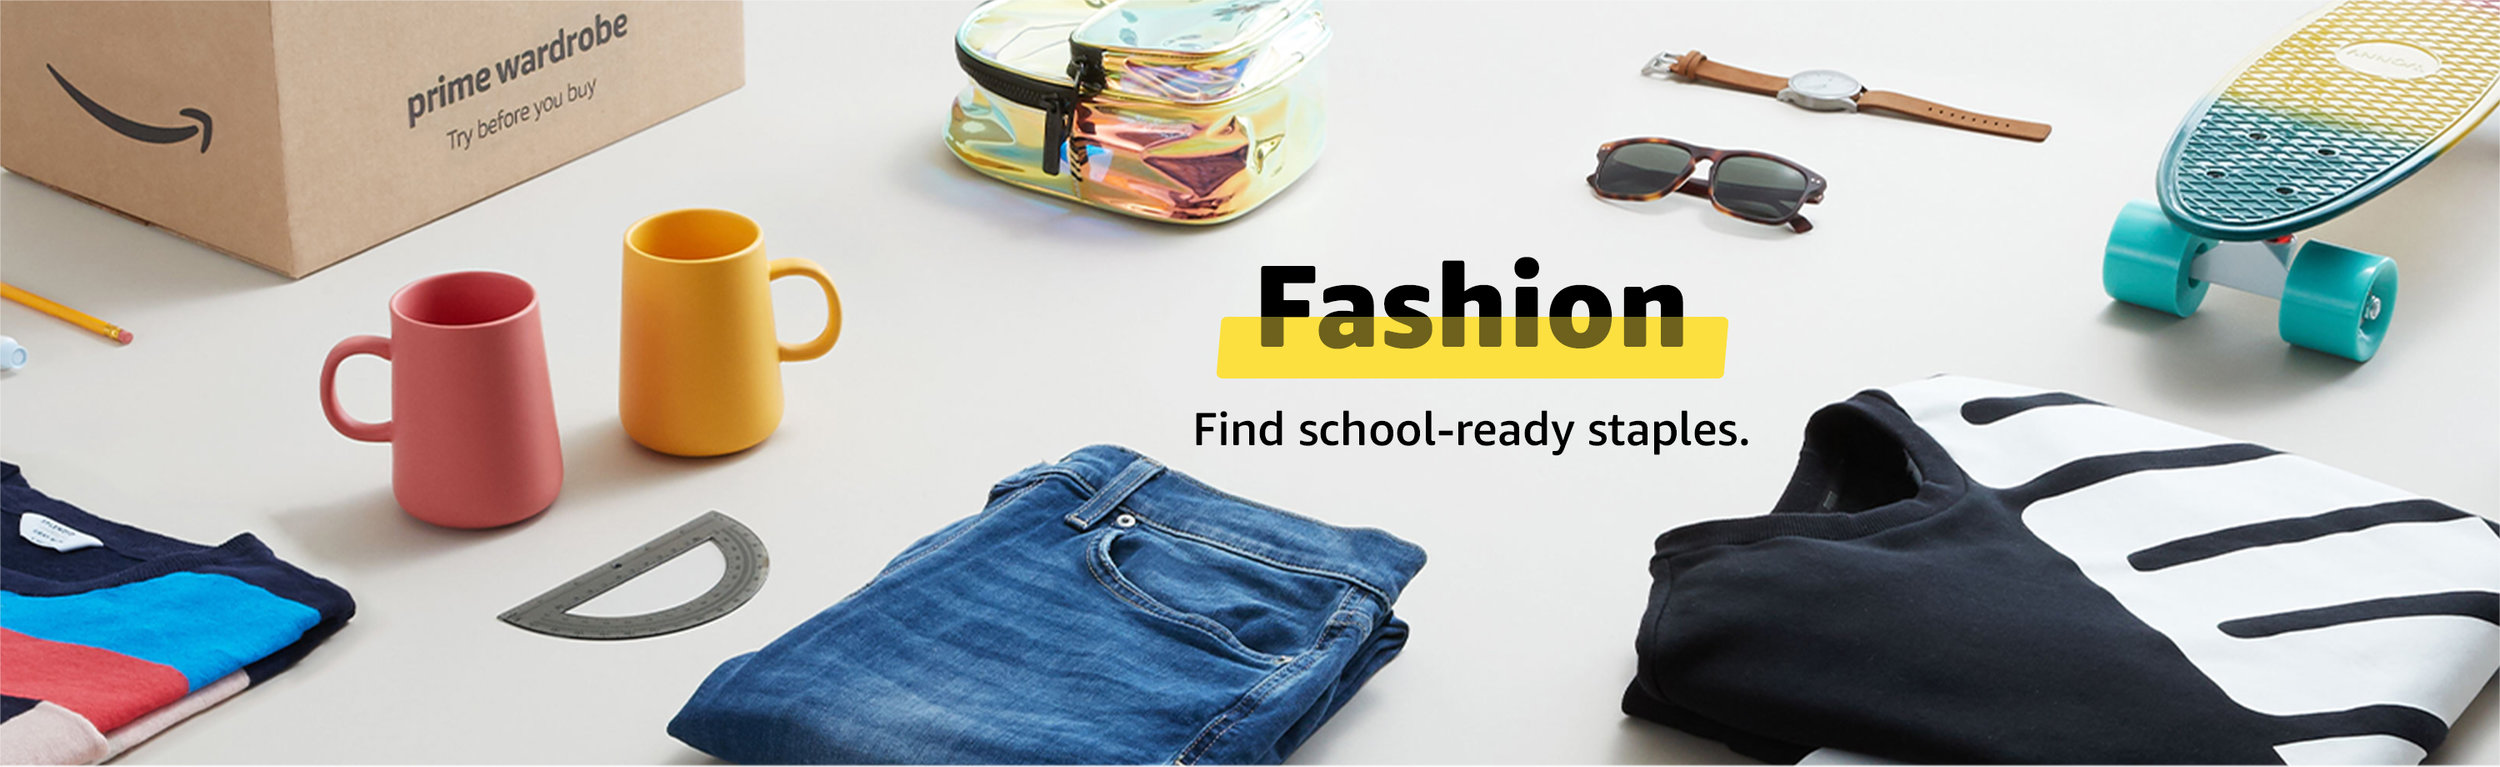 mens-college-flat-lay-product-stylist-jesica-kurashima.jpg